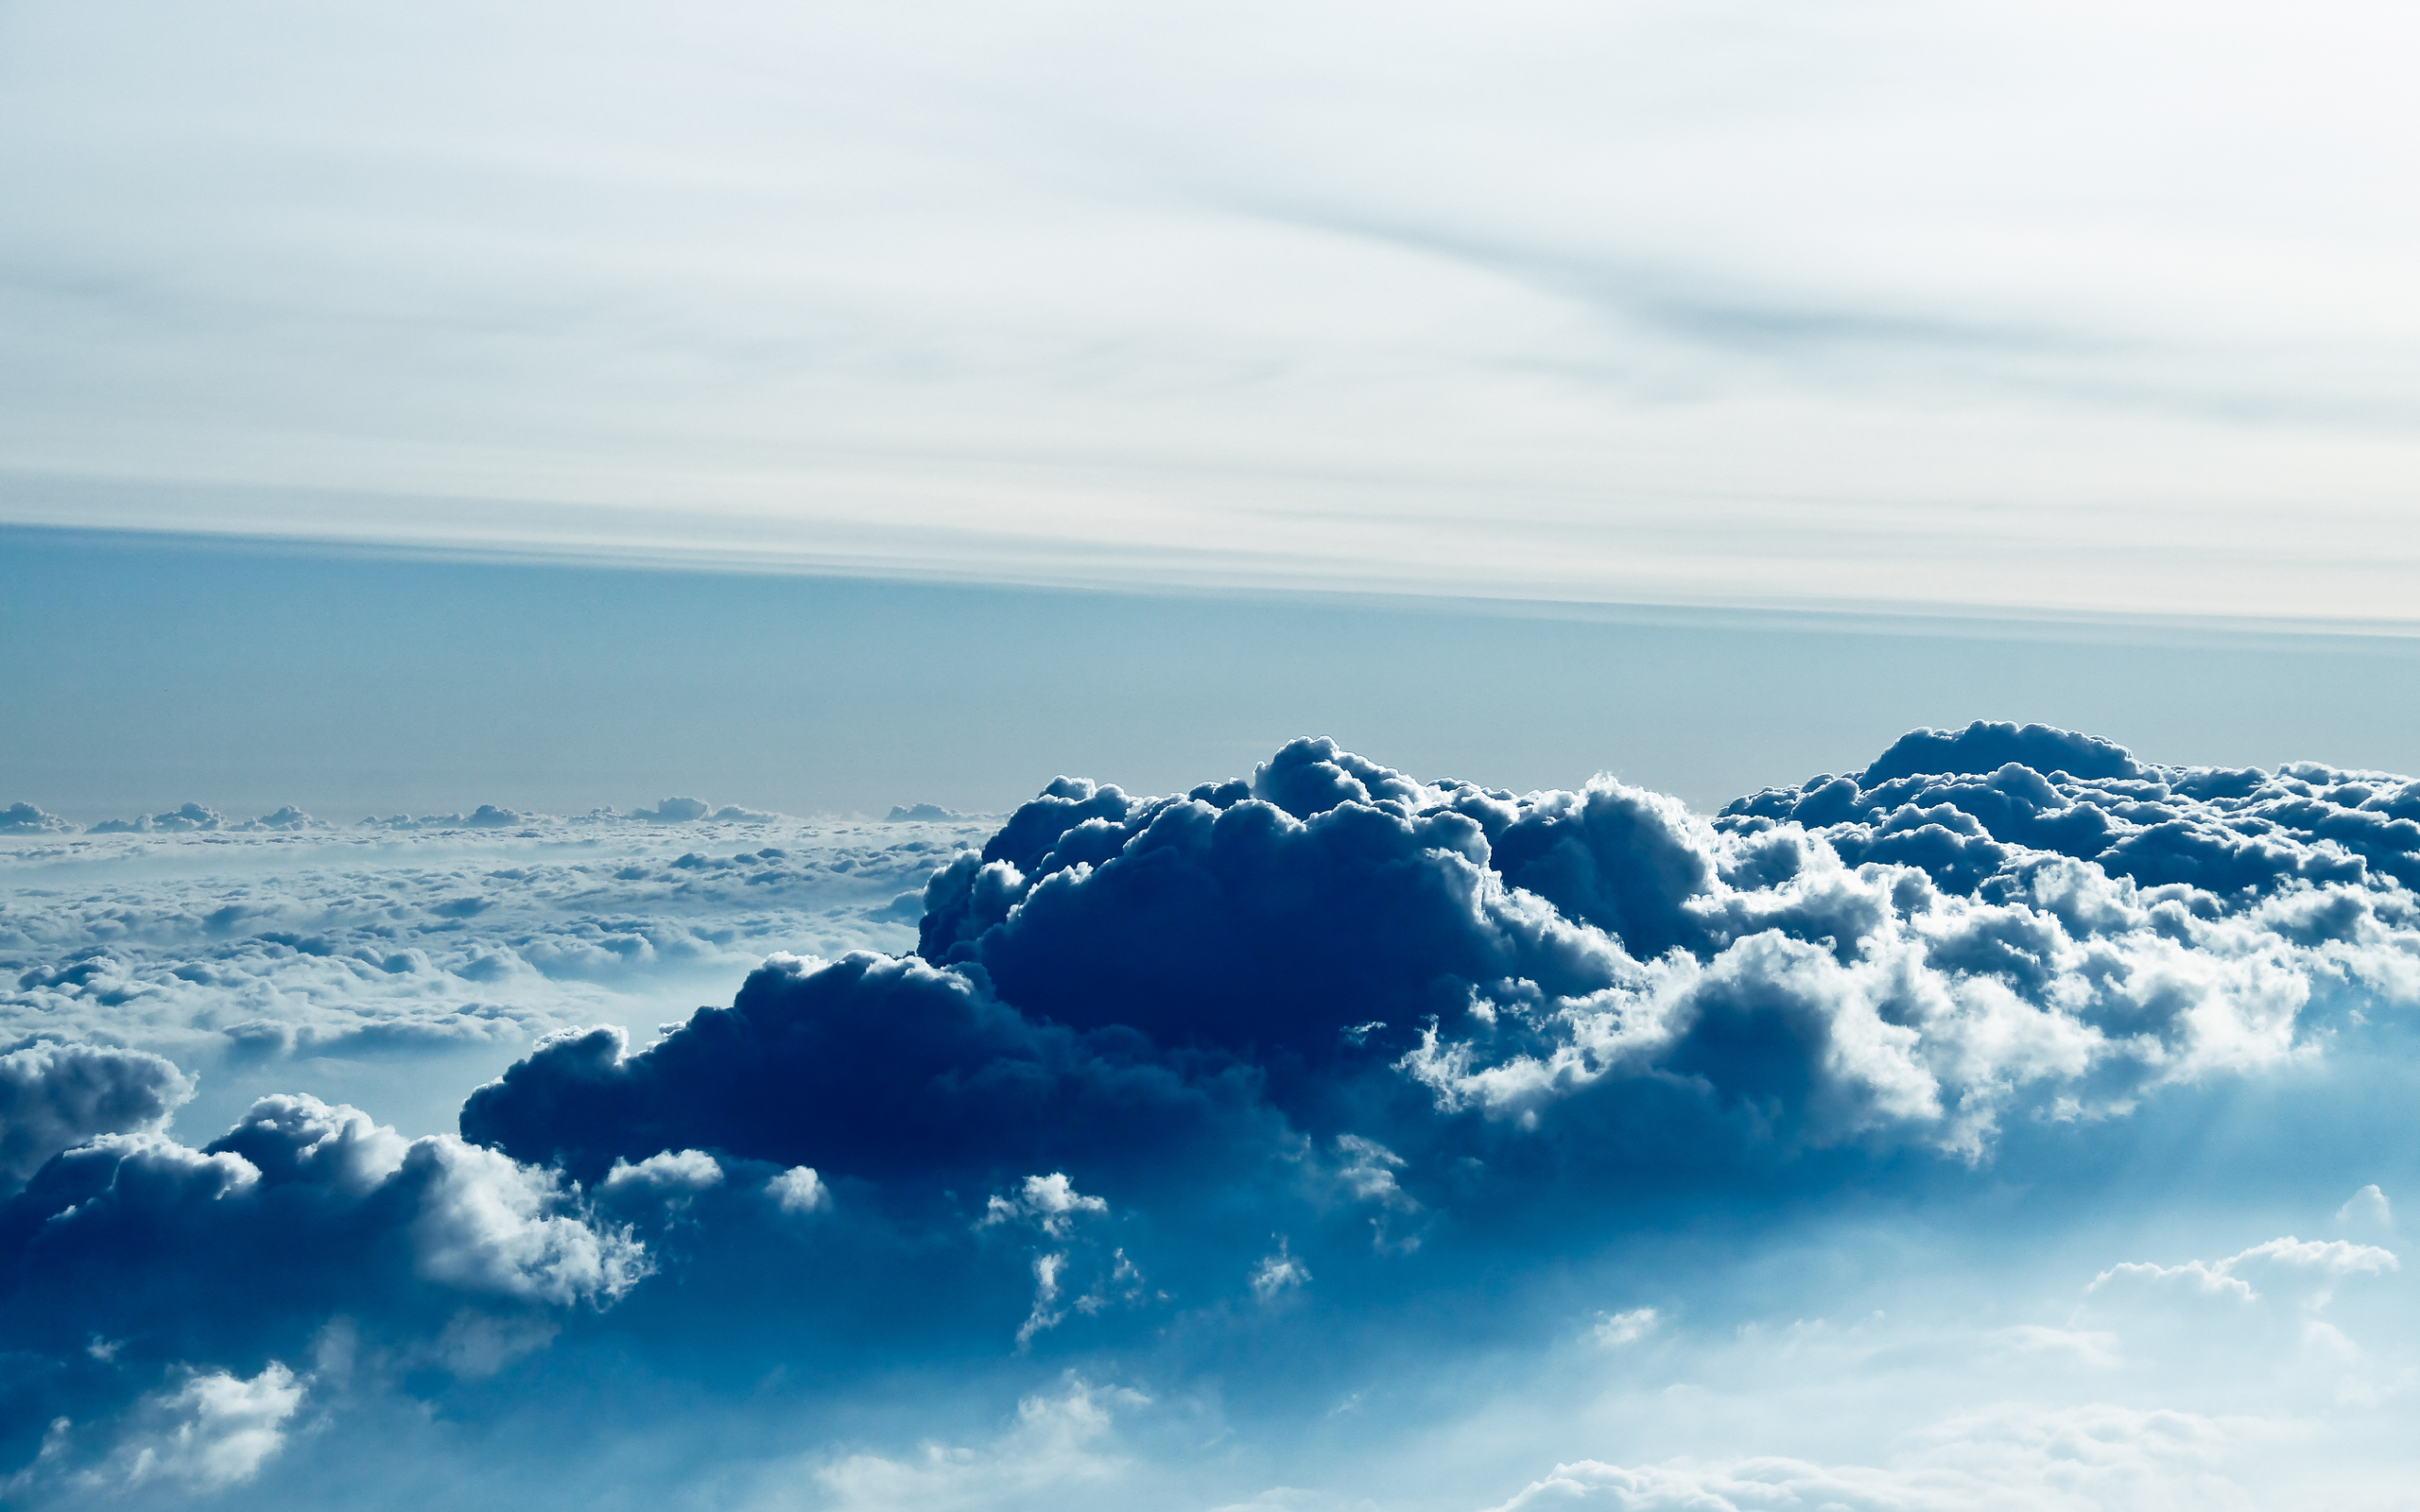 Cloud Hd Wallpaper Background Image 2560x1600